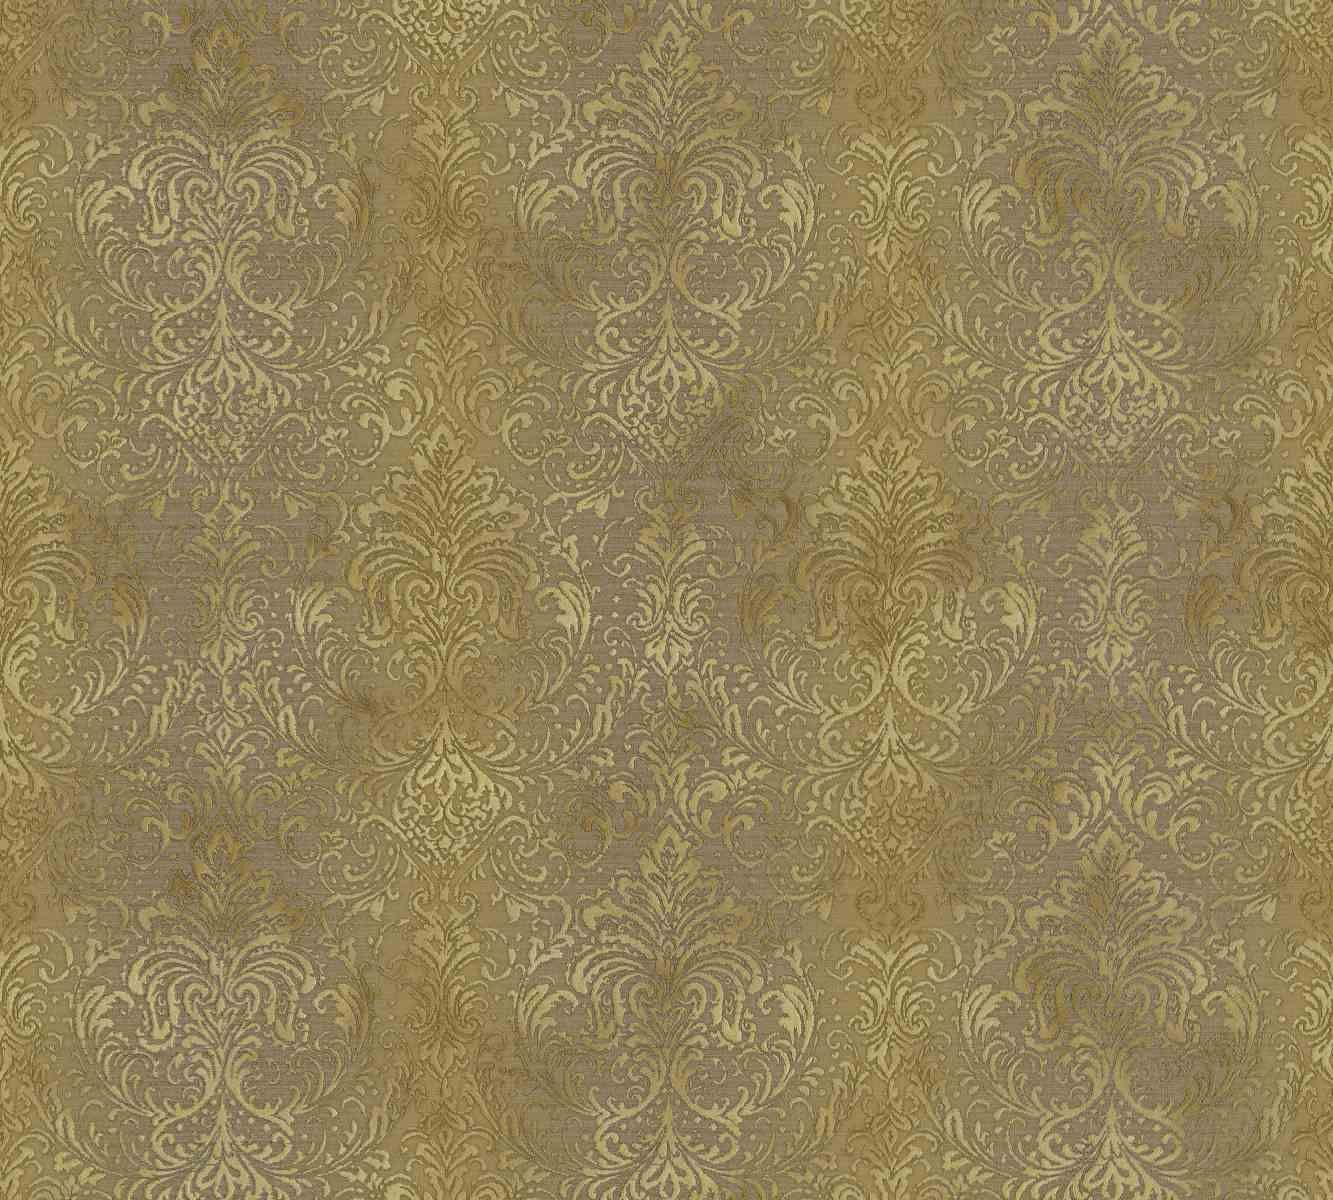 mystique classic damask wall paper brown metallic 959105